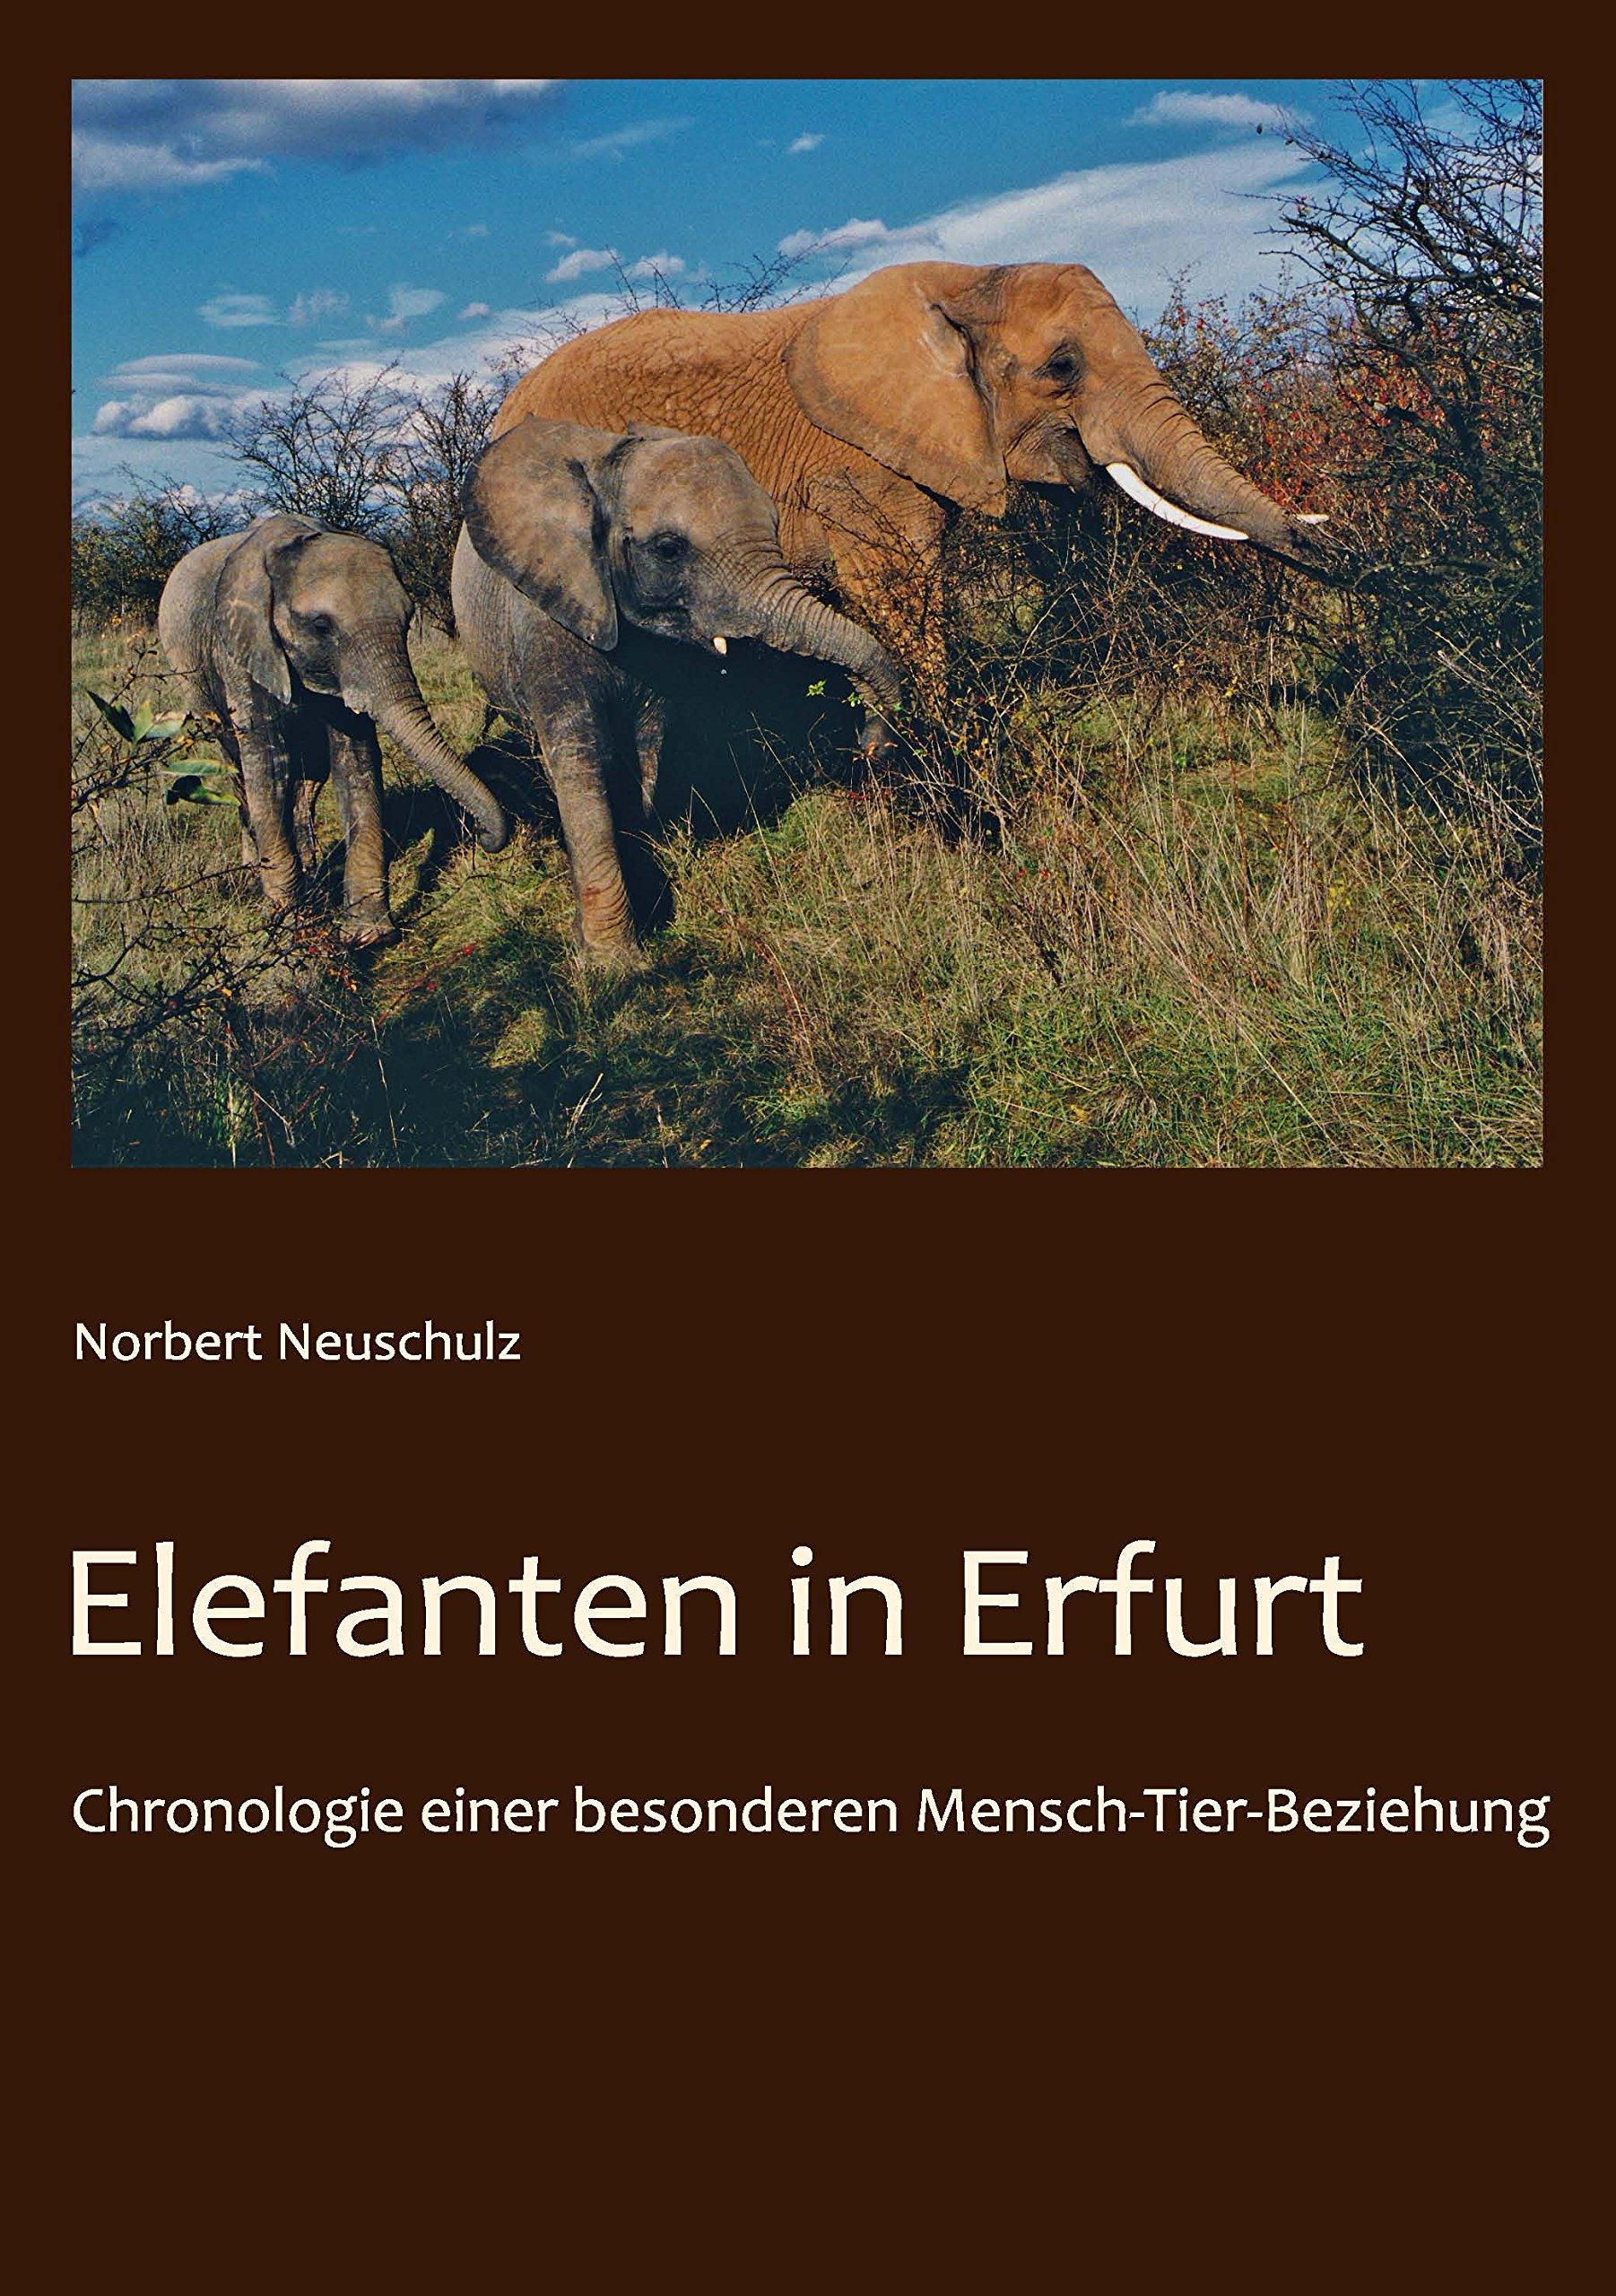 Elefanten in Erfurt: Chronologie einer besonderen Mensch-Tier-Beziehung